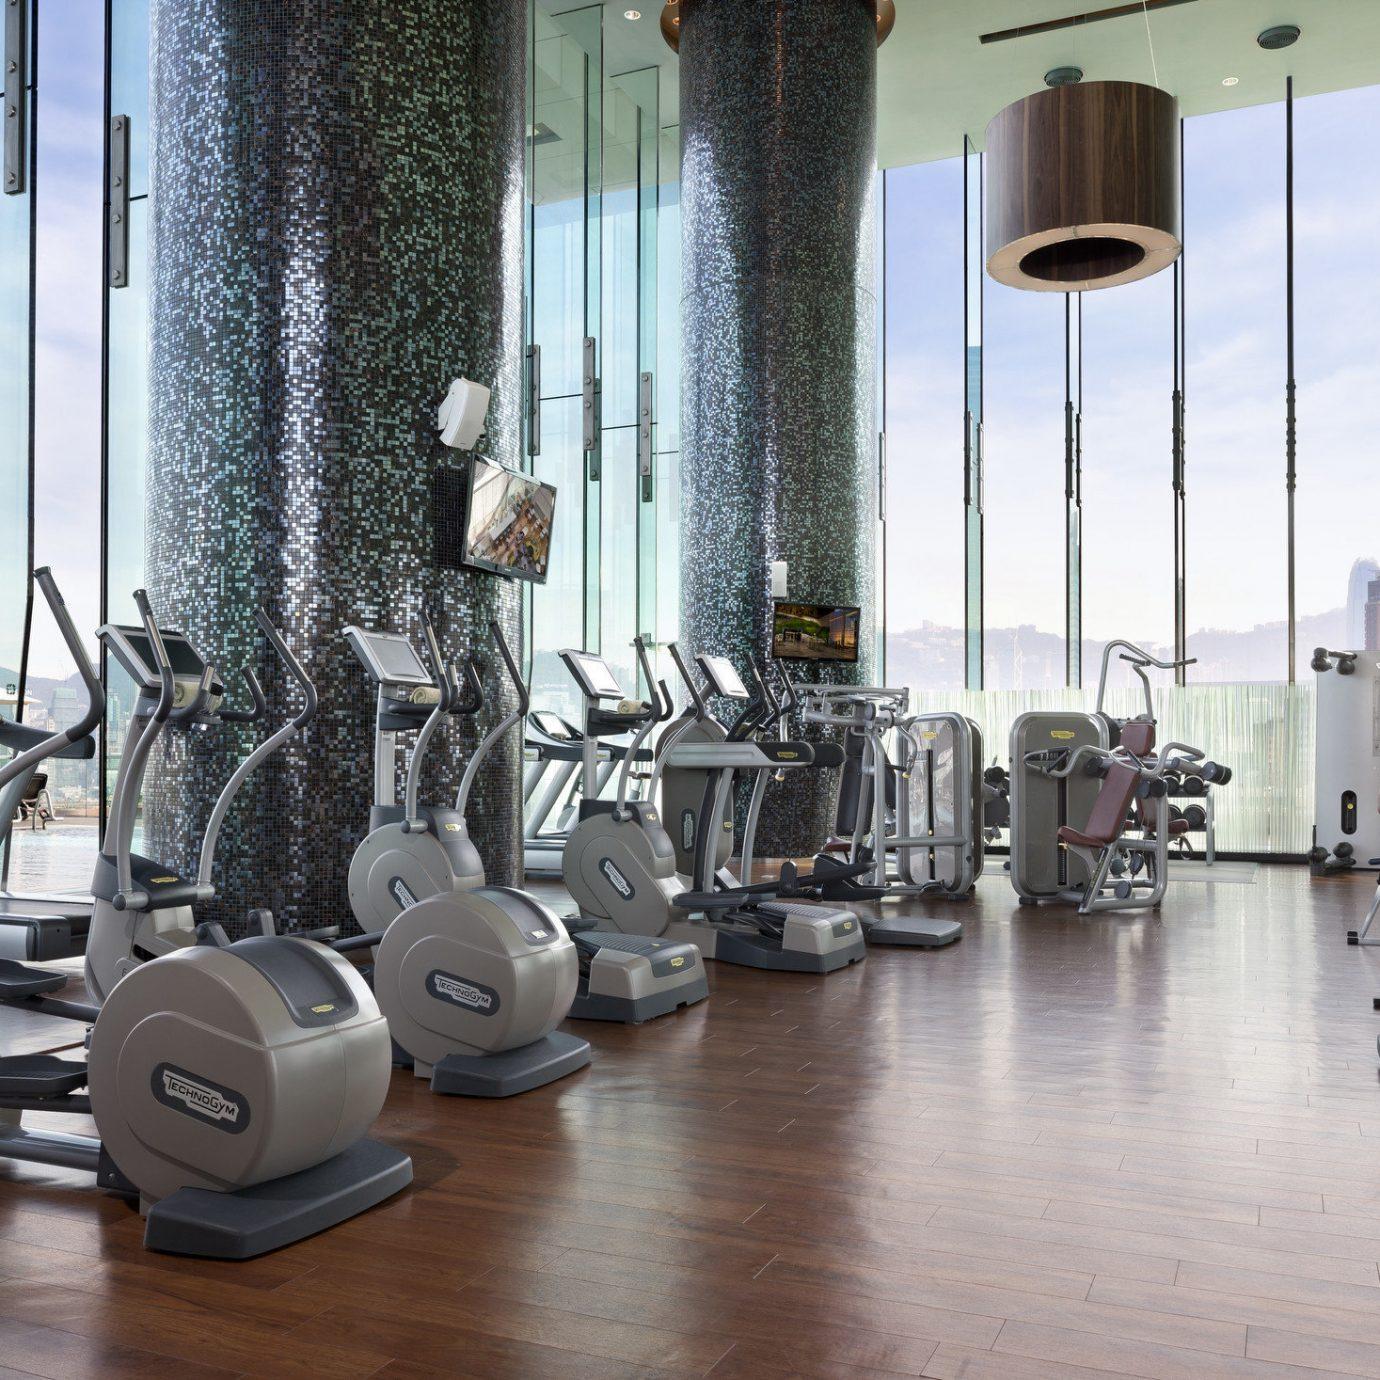 structure property gym sport venue condominium